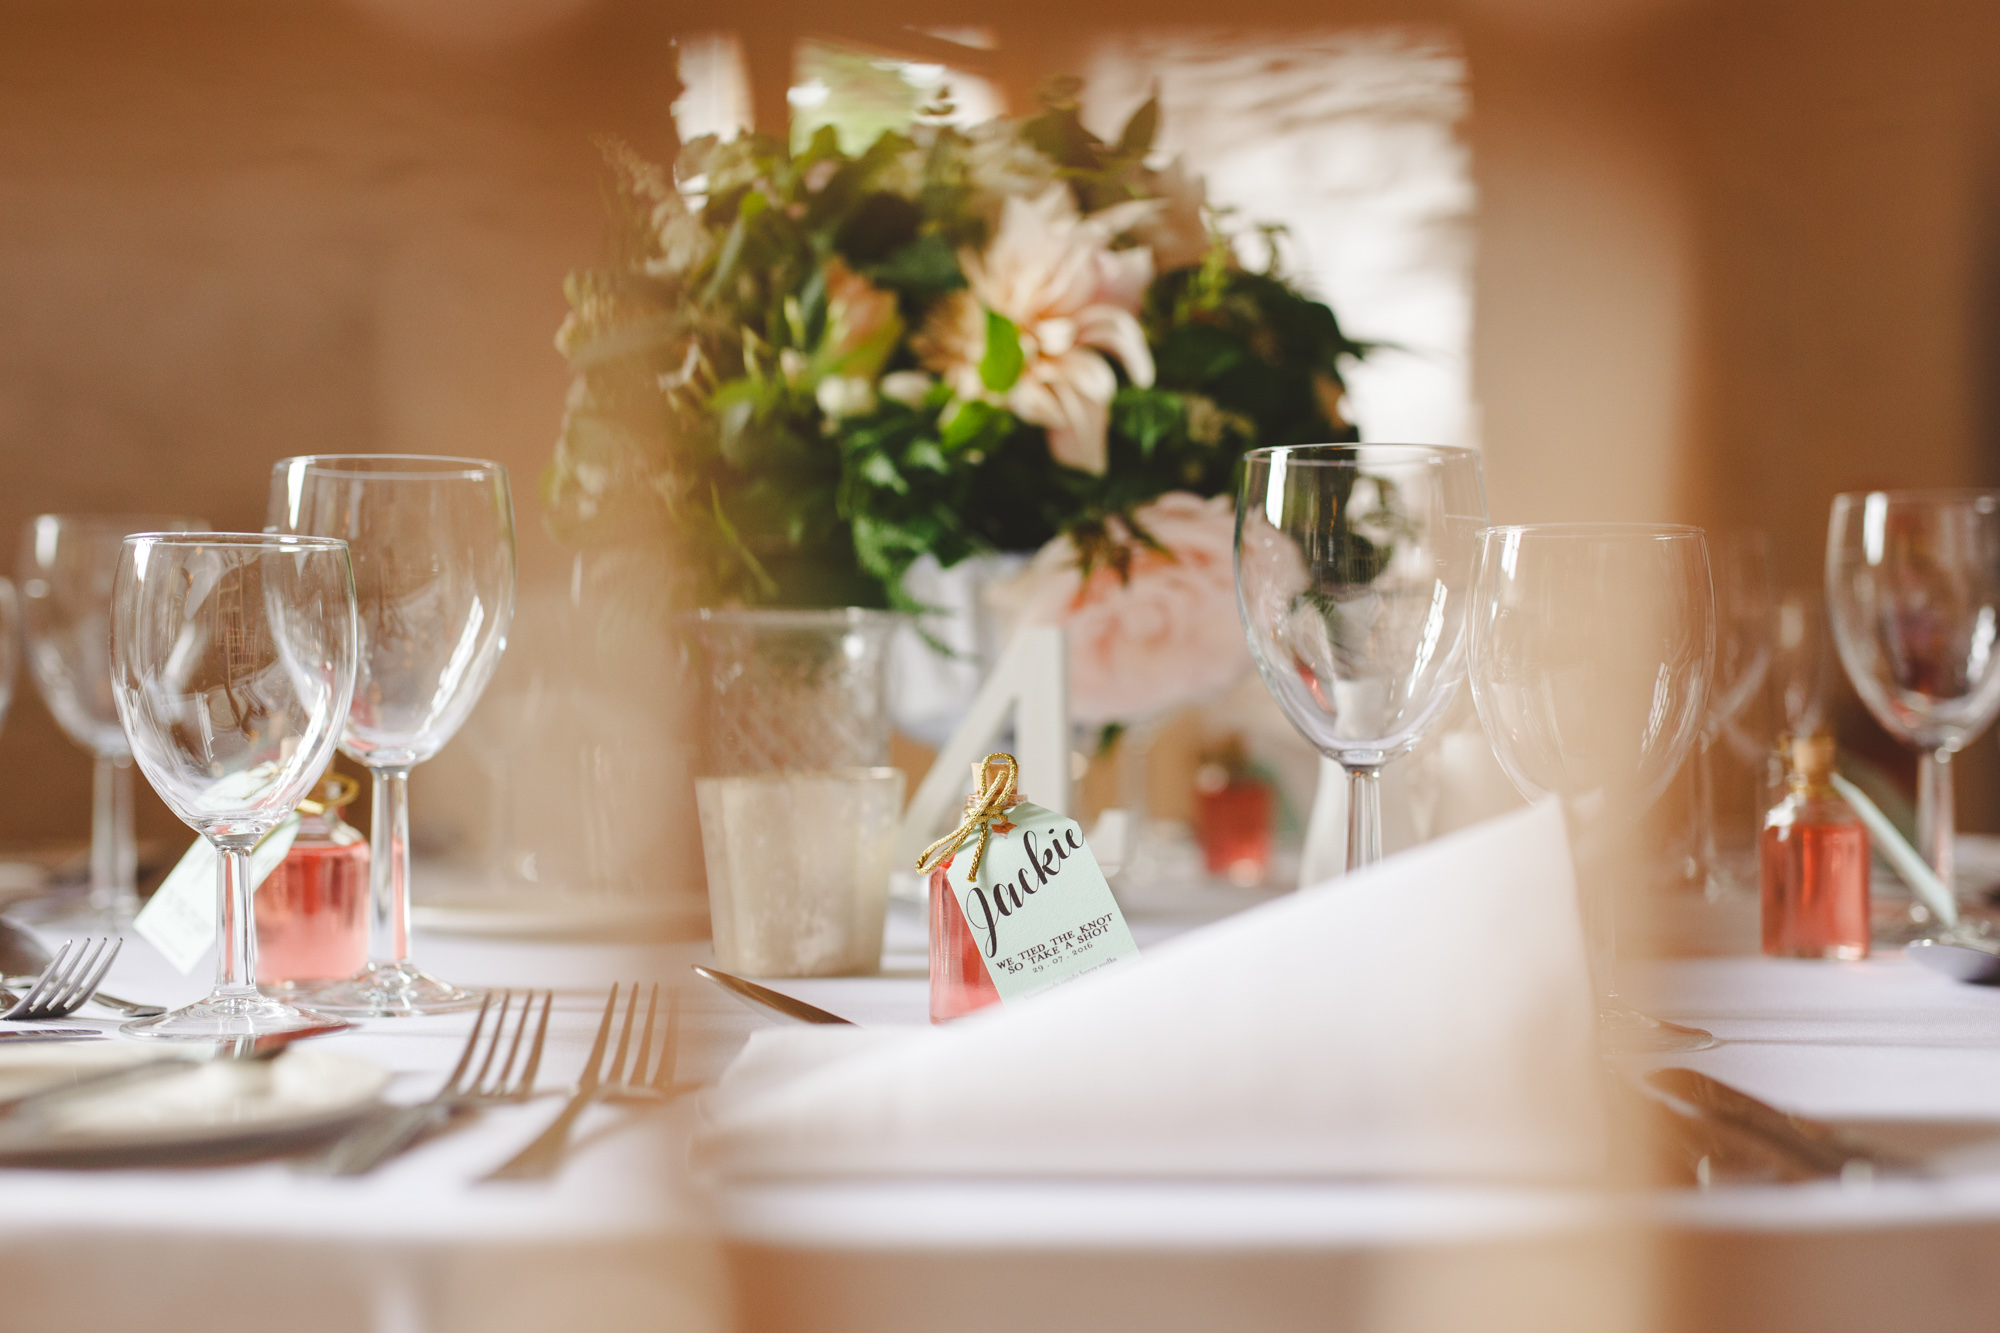 hestercombe-taunton-wedding-photography-camera-hannah-4.jpg